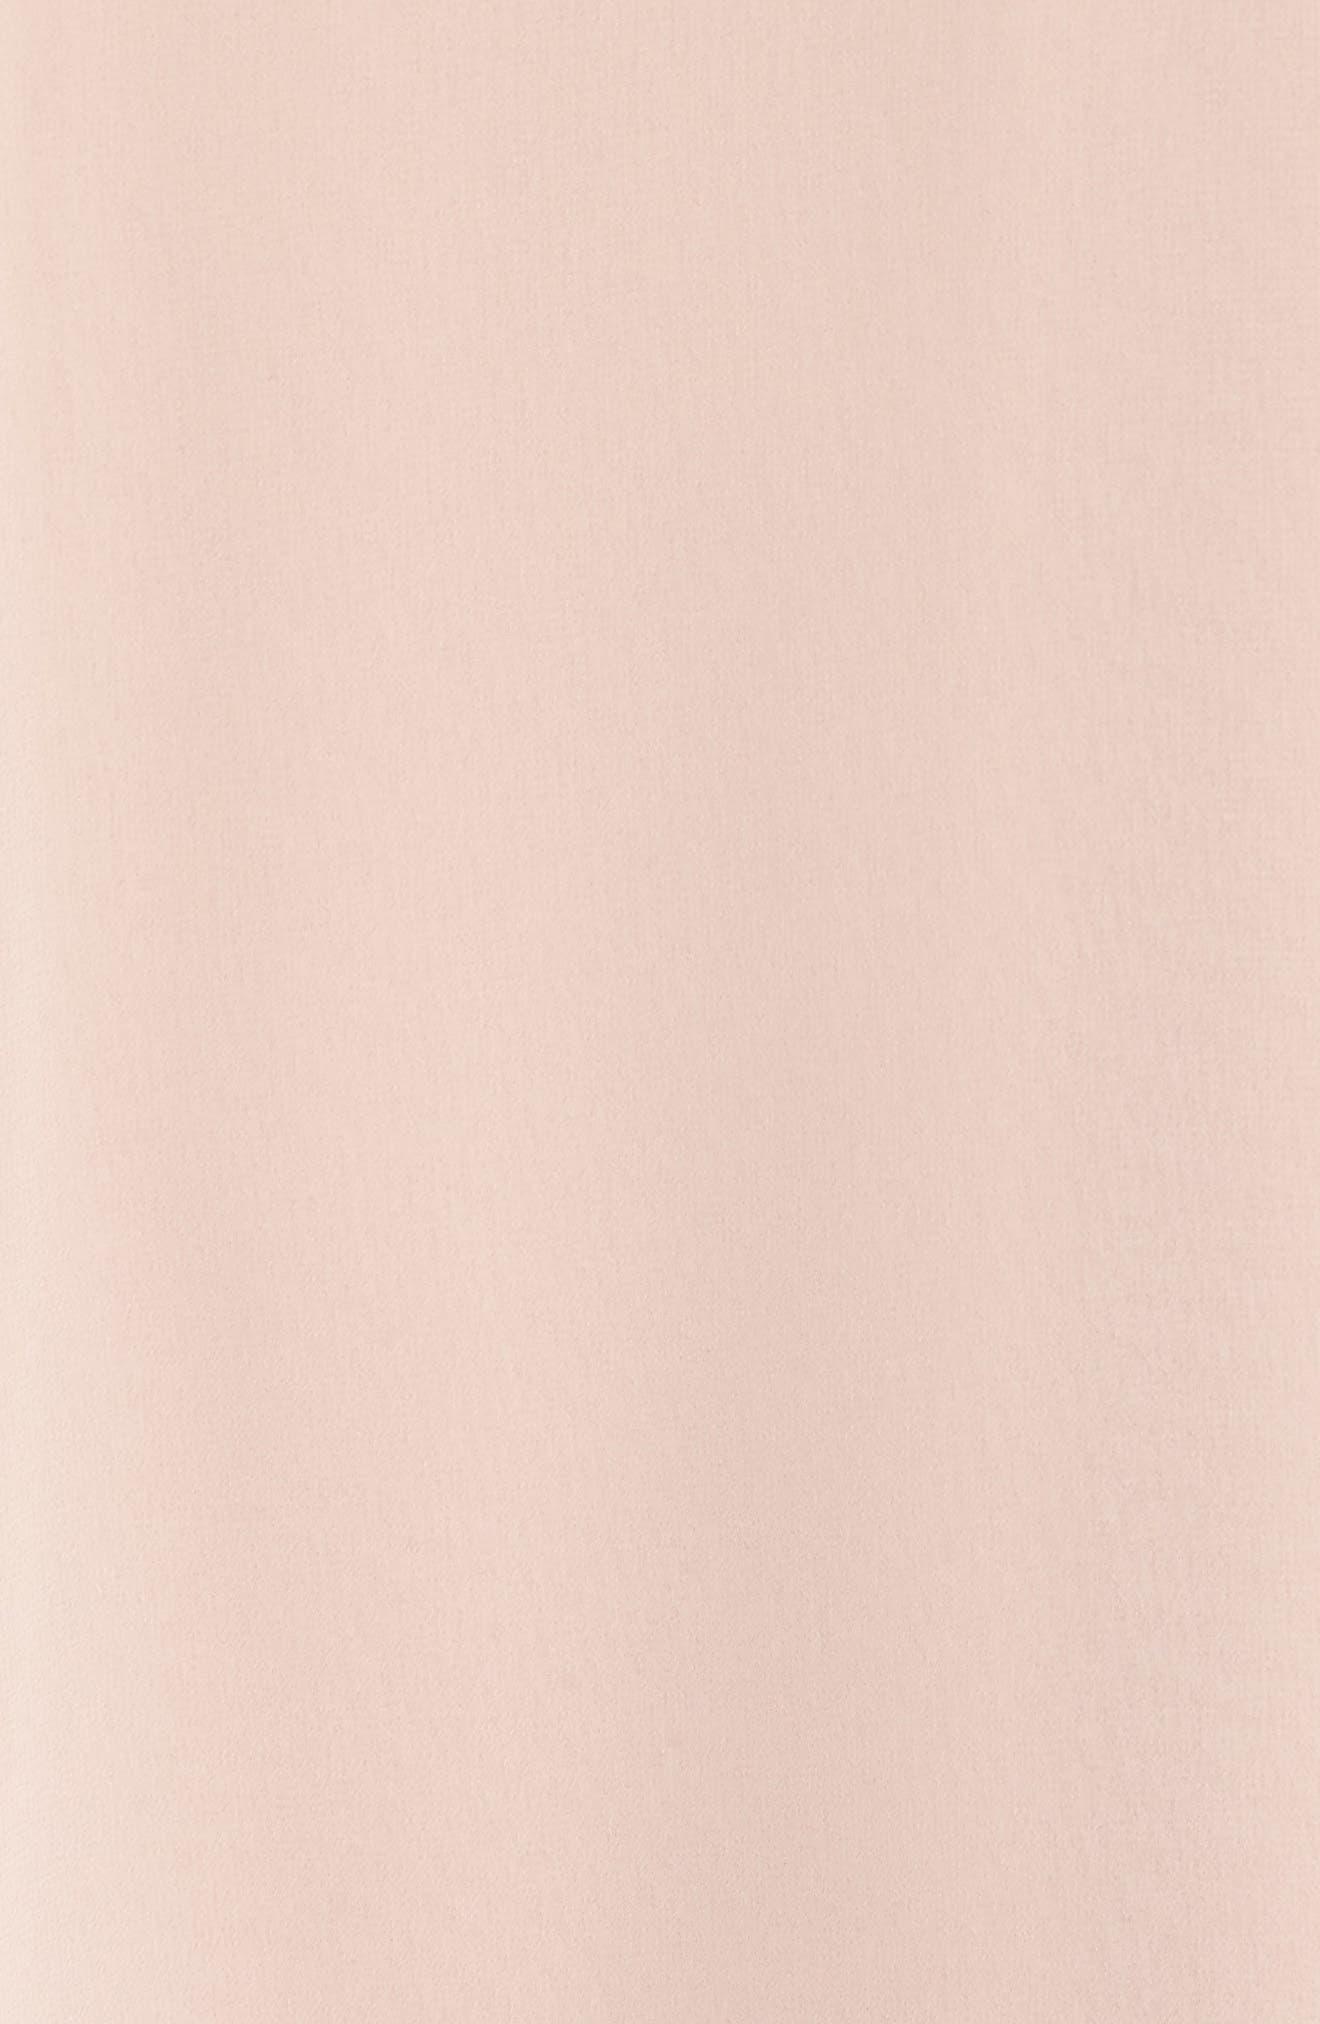 XSCAPE, Beaded Neck Chiffon Overlay Dress, Alternate thumbnail 6, color, BLUSH/ SILVER